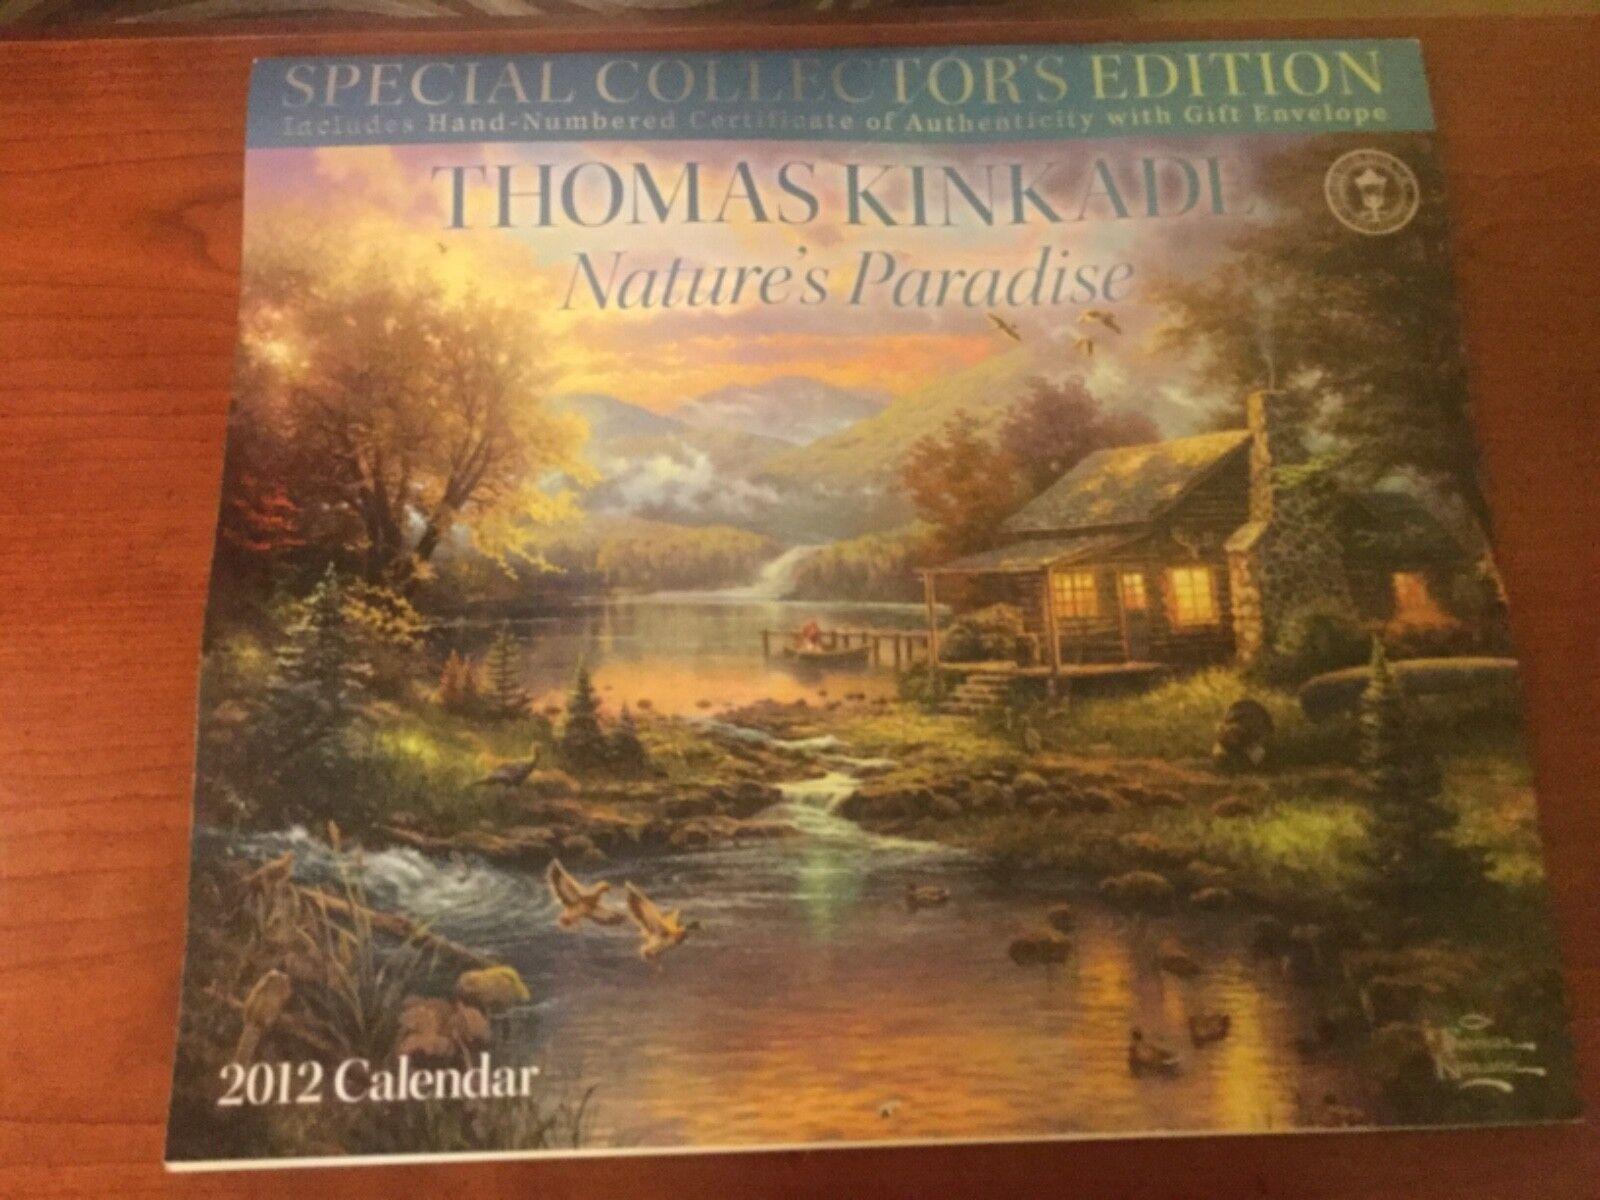 thomas kinkade special collectors edition natures paradise 2012 wall calendar